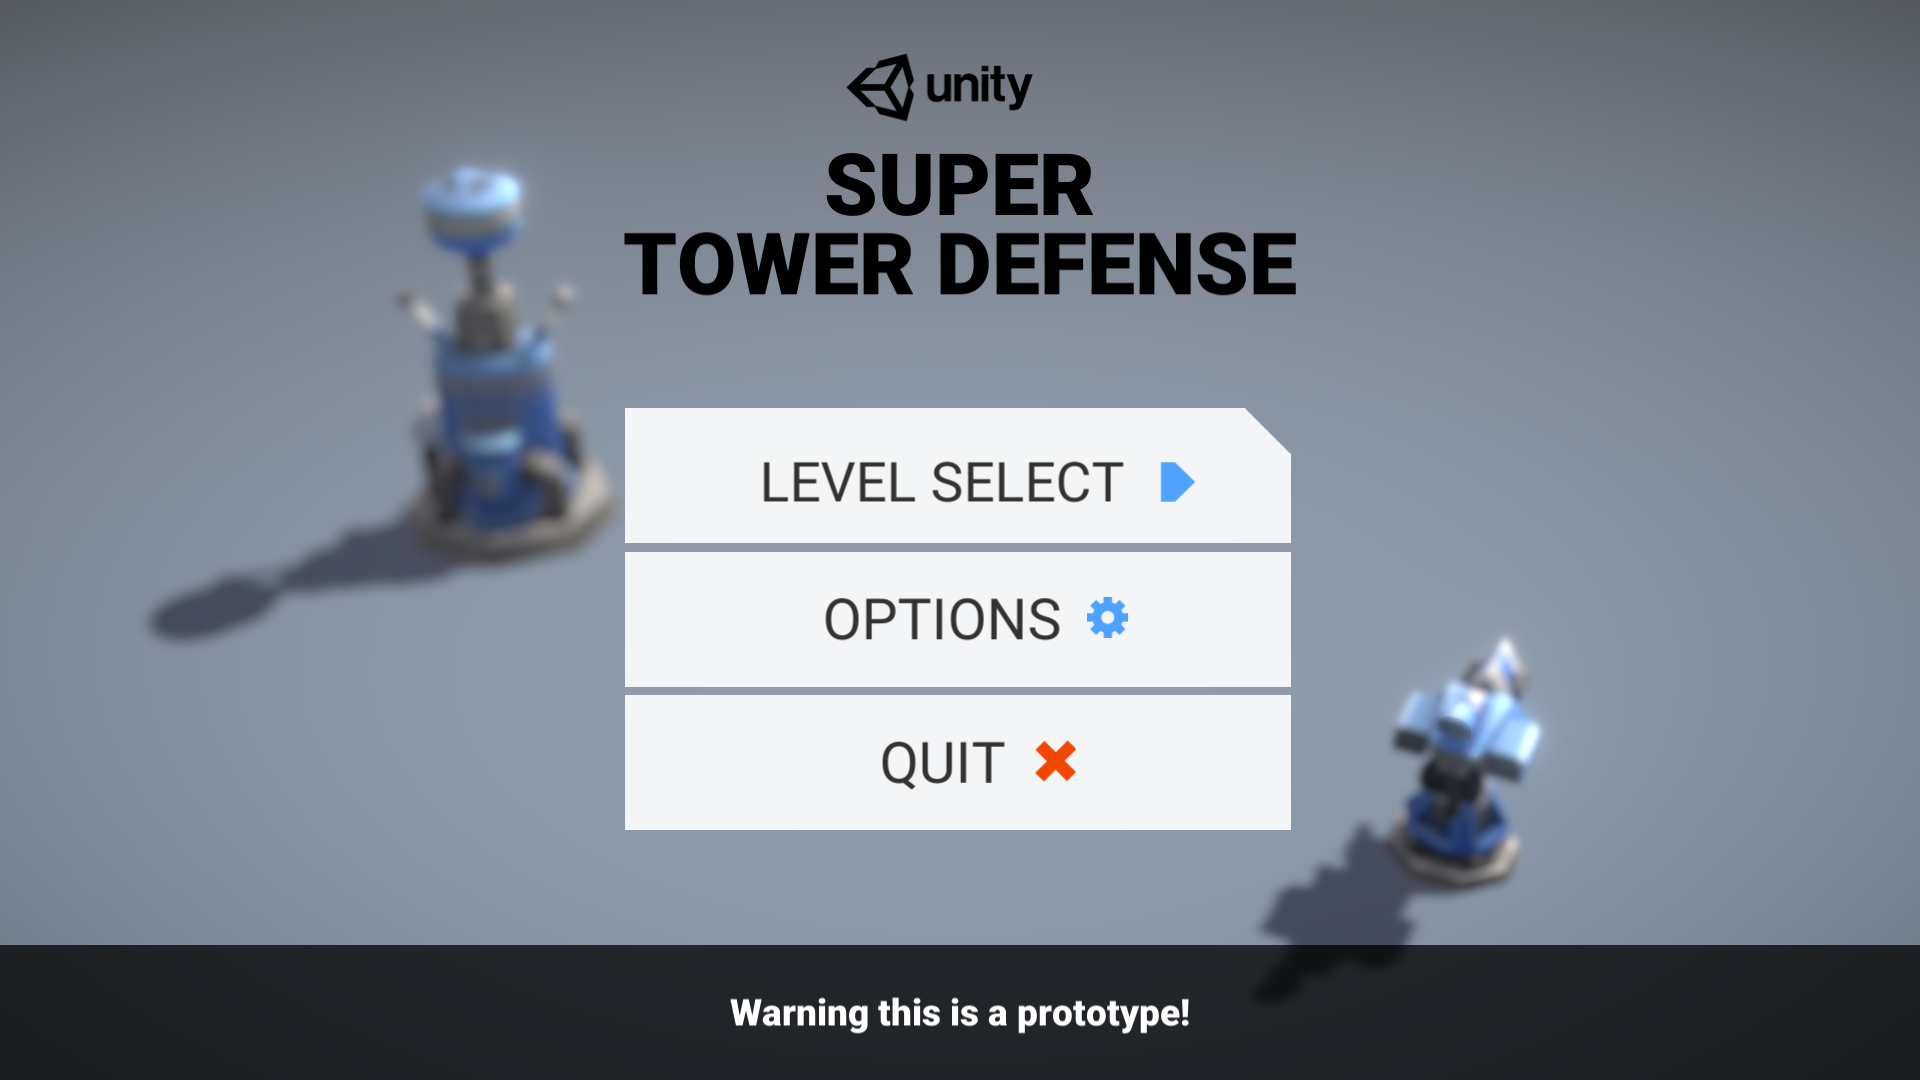 STD (Super Tower Defense)